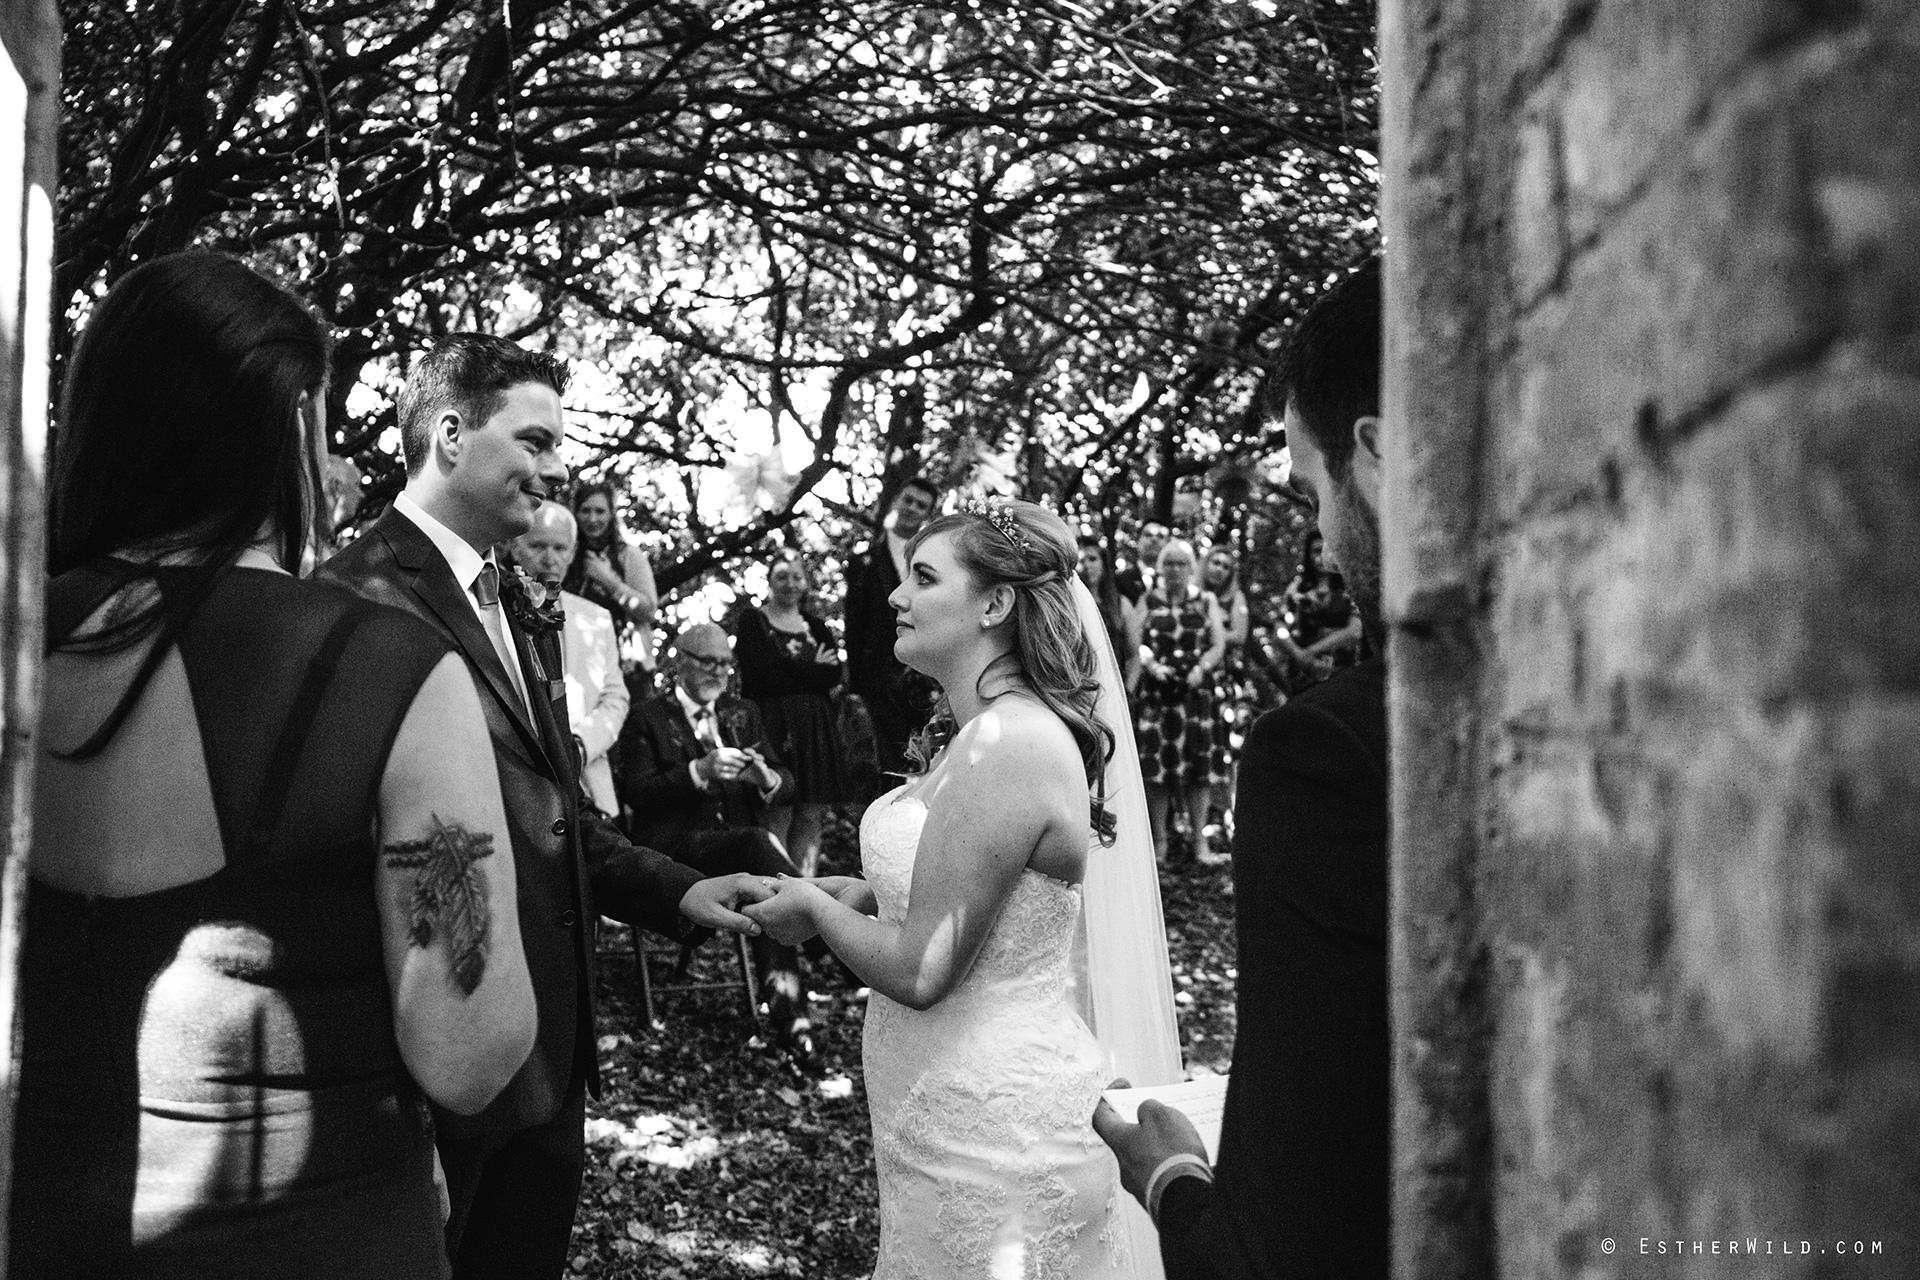 Norfolk_Wedding_Photographer_Mannington_Hall_Country_Esther_Wild_1028-1.jpg